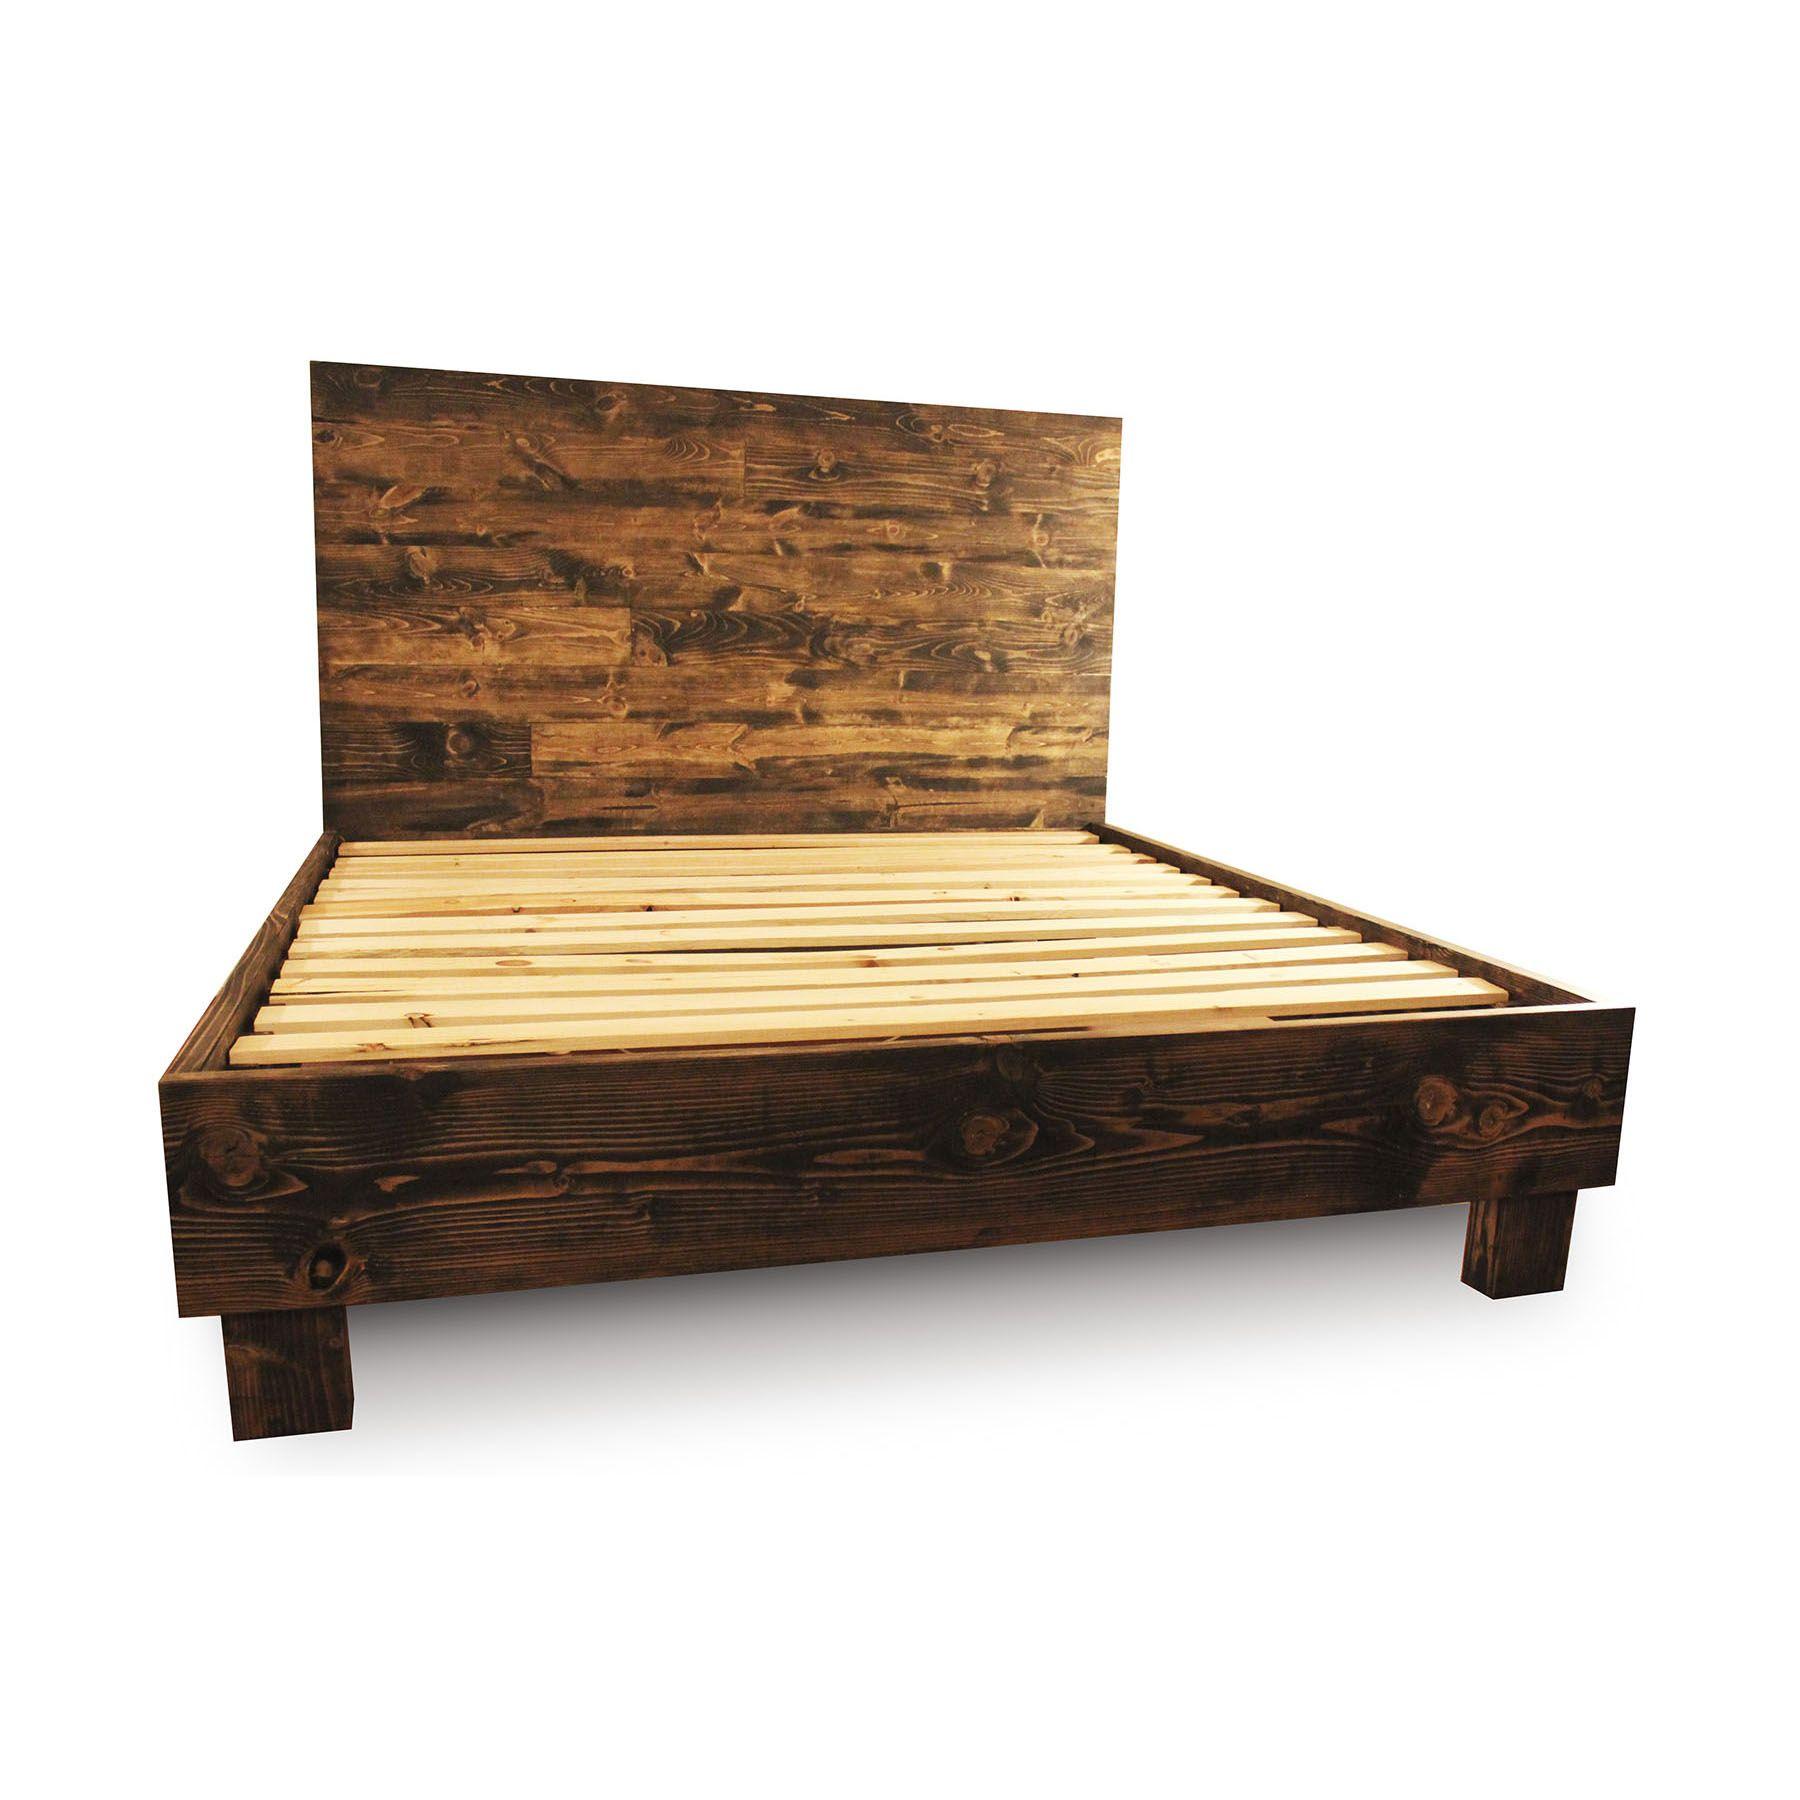 Buy A Custom Made Rustic Solid Wood Platform Bed Frame